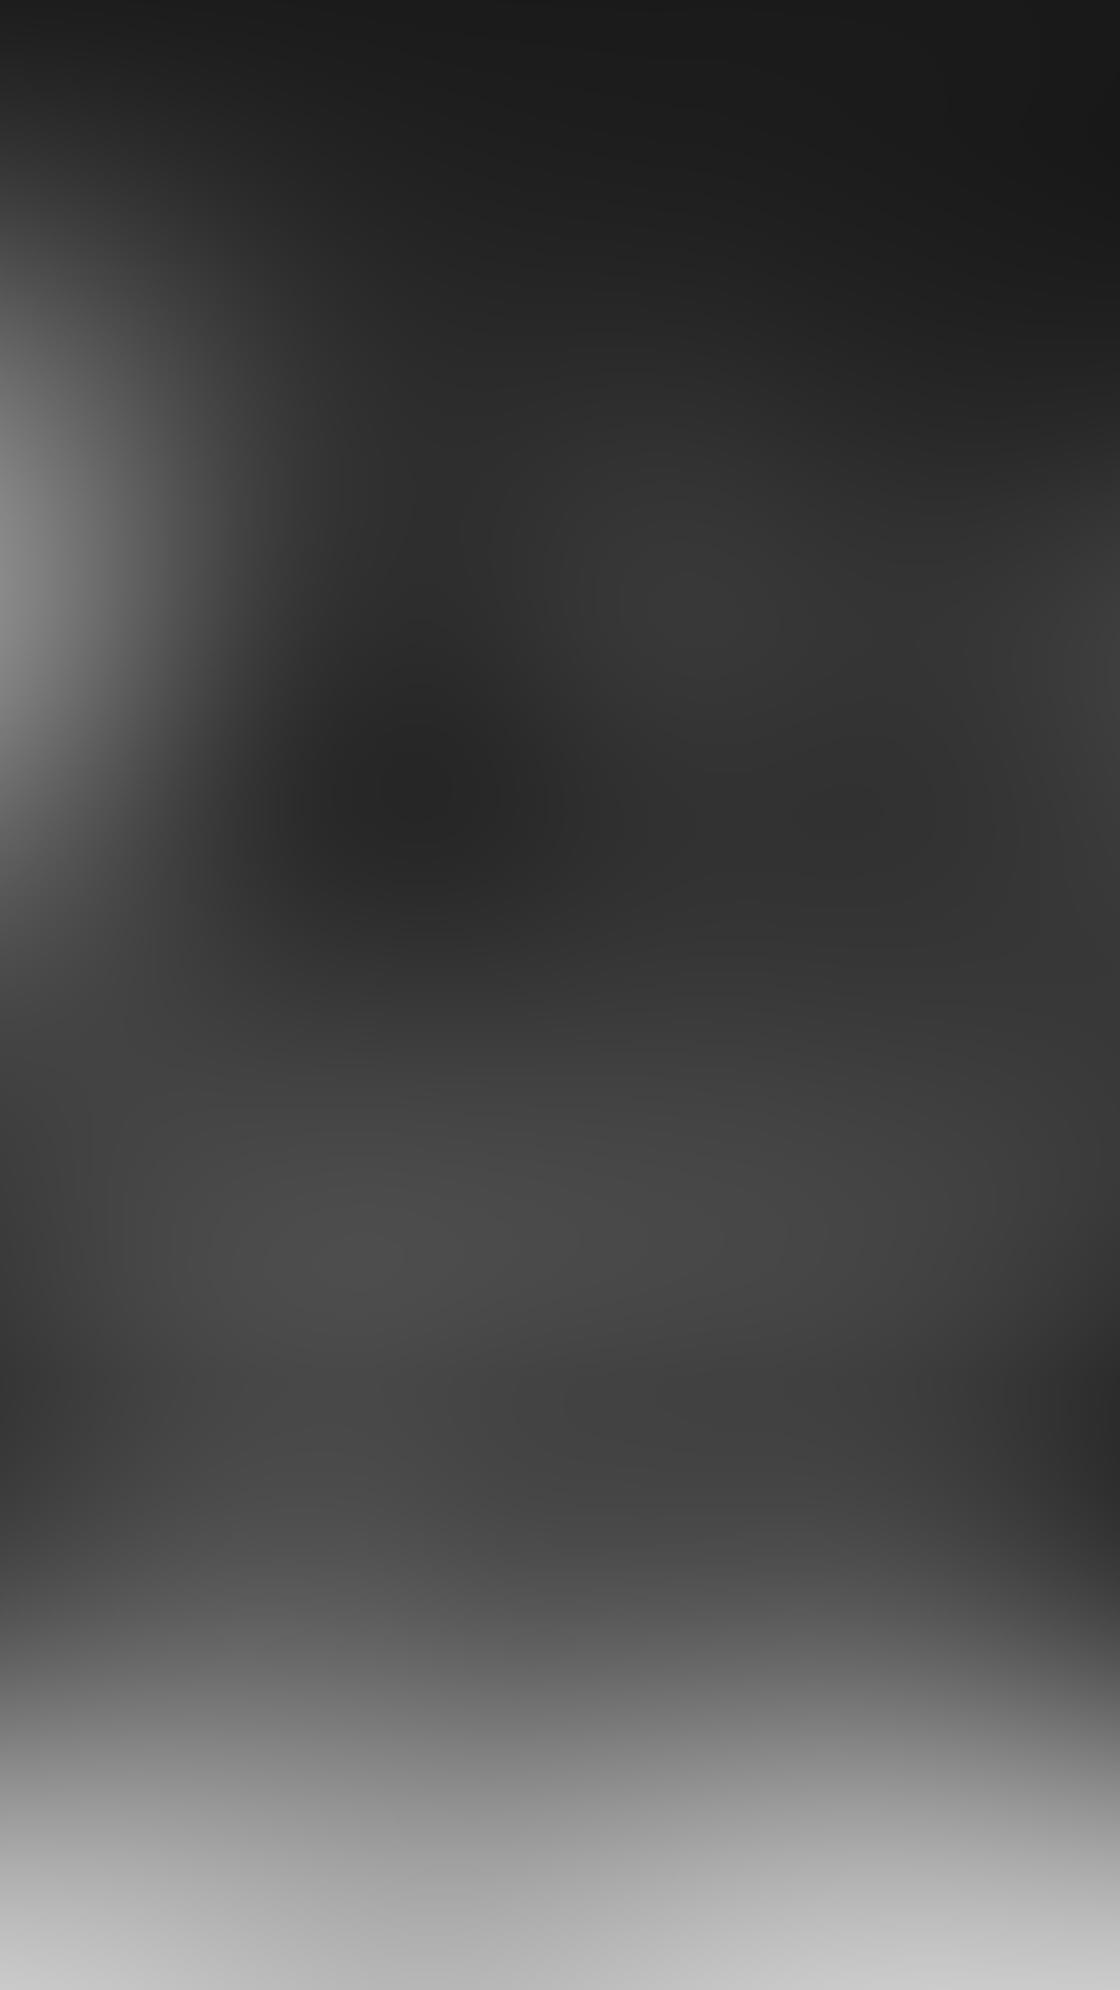 Lens Distortions iPhone App 2